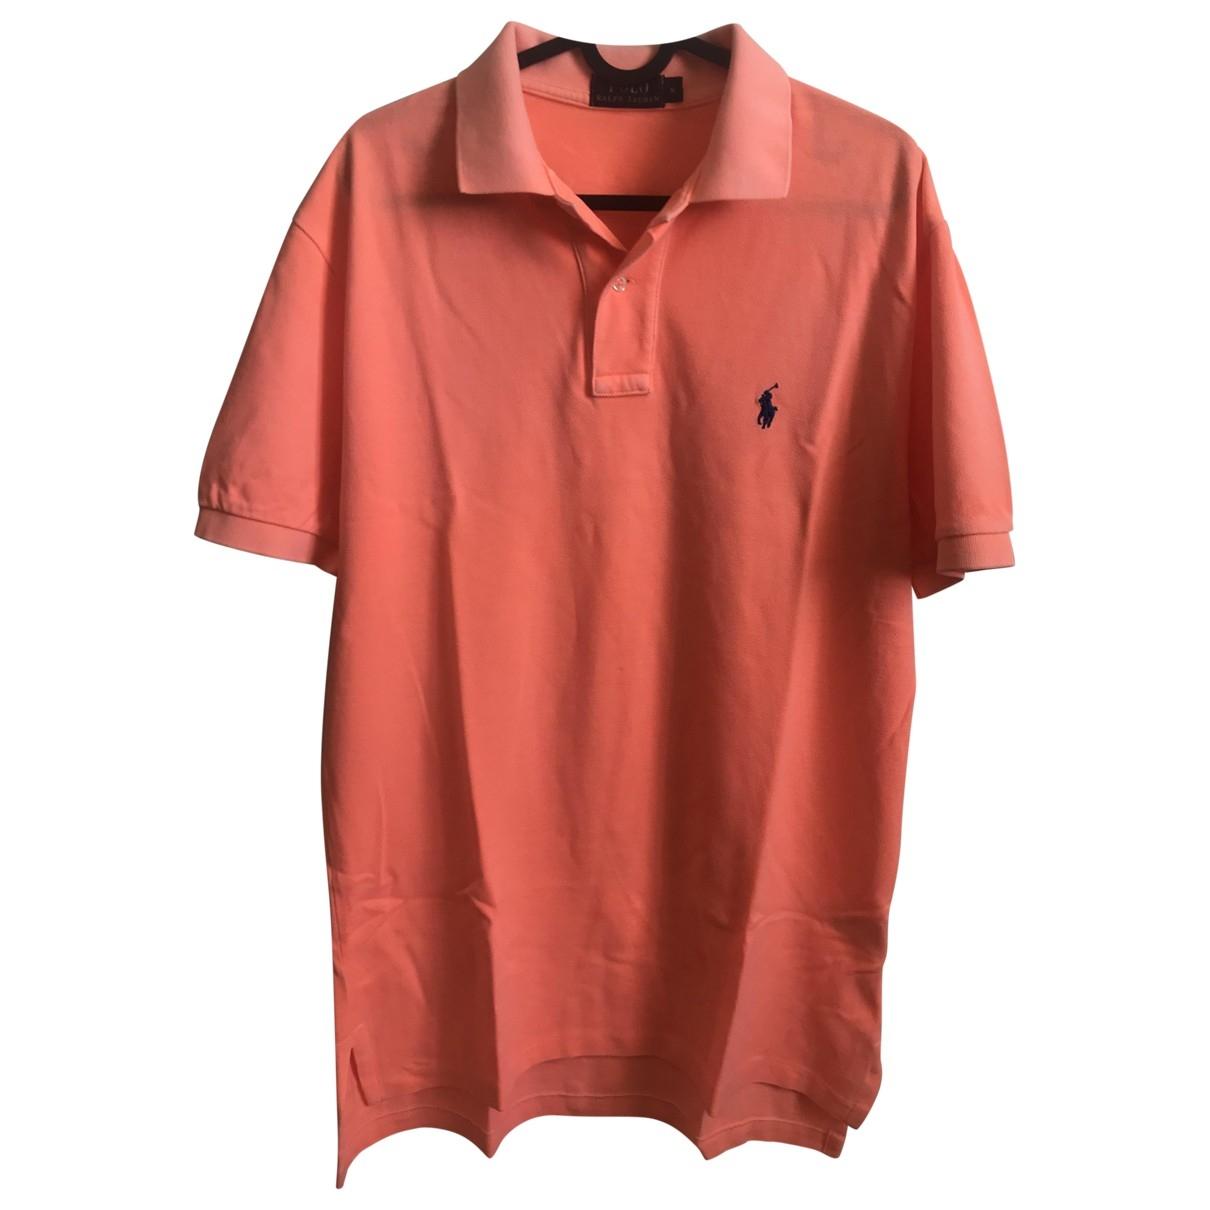 Polo Ralph Lauren - Polos   pour homme en coton - orange